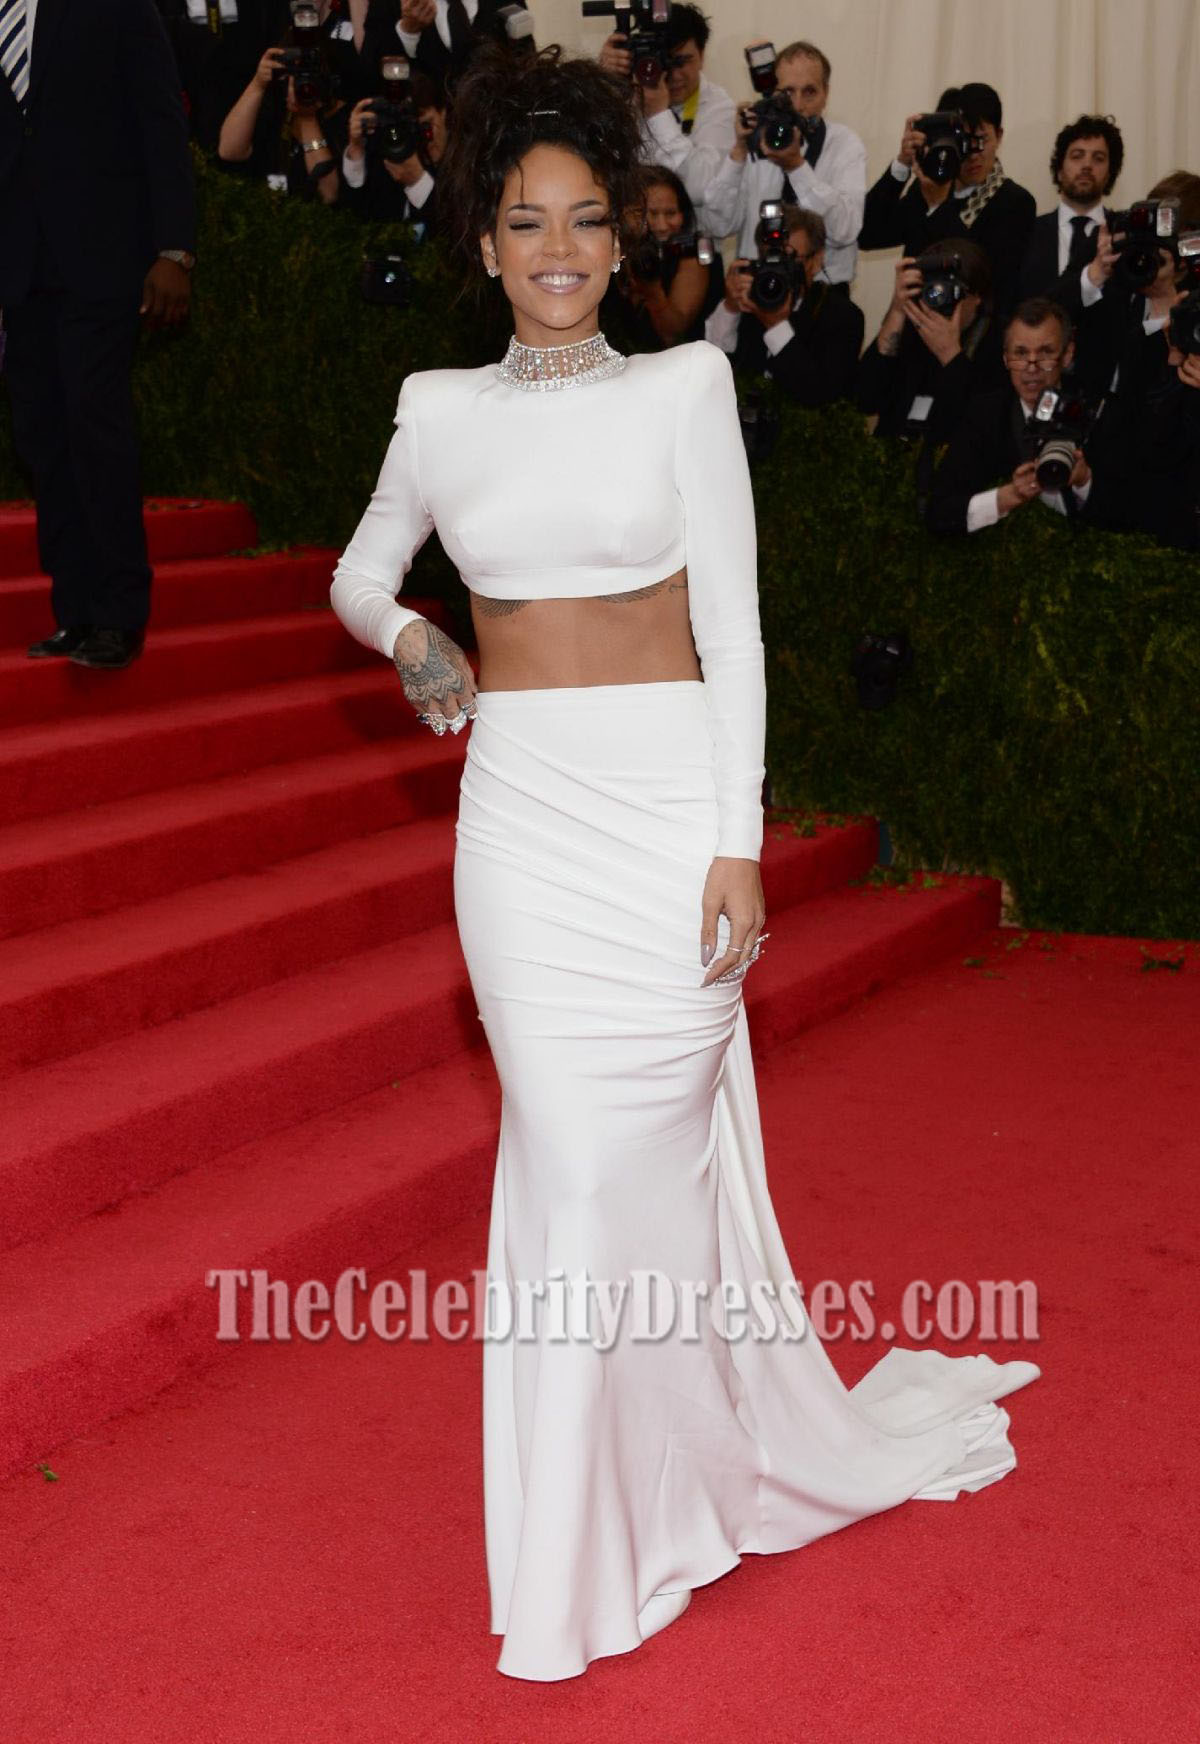 White Evening Gown Dresses_Evening Dresses_dressesss